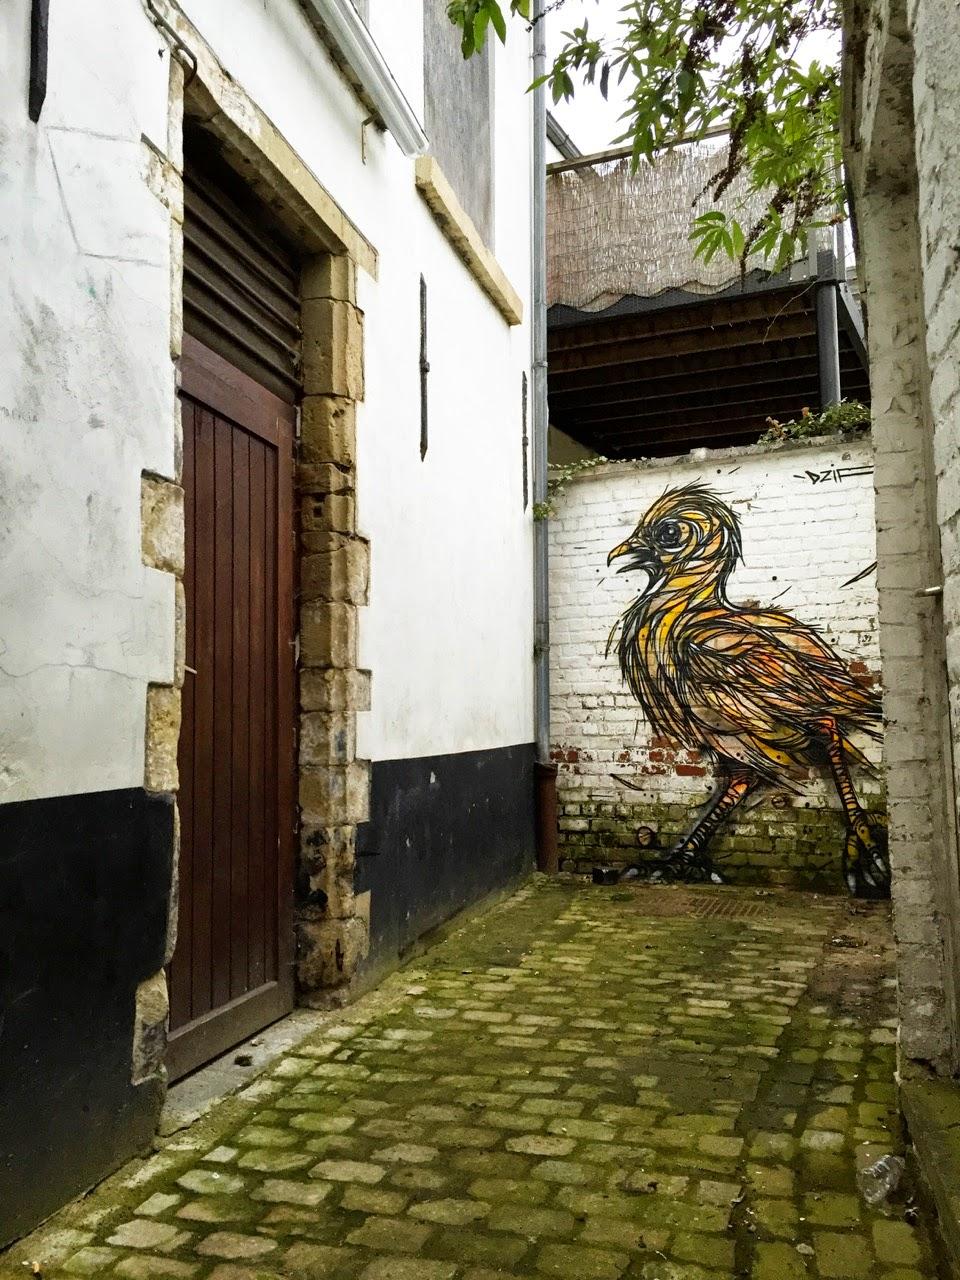 Wavre Belgium  City pictures : DZIA paints